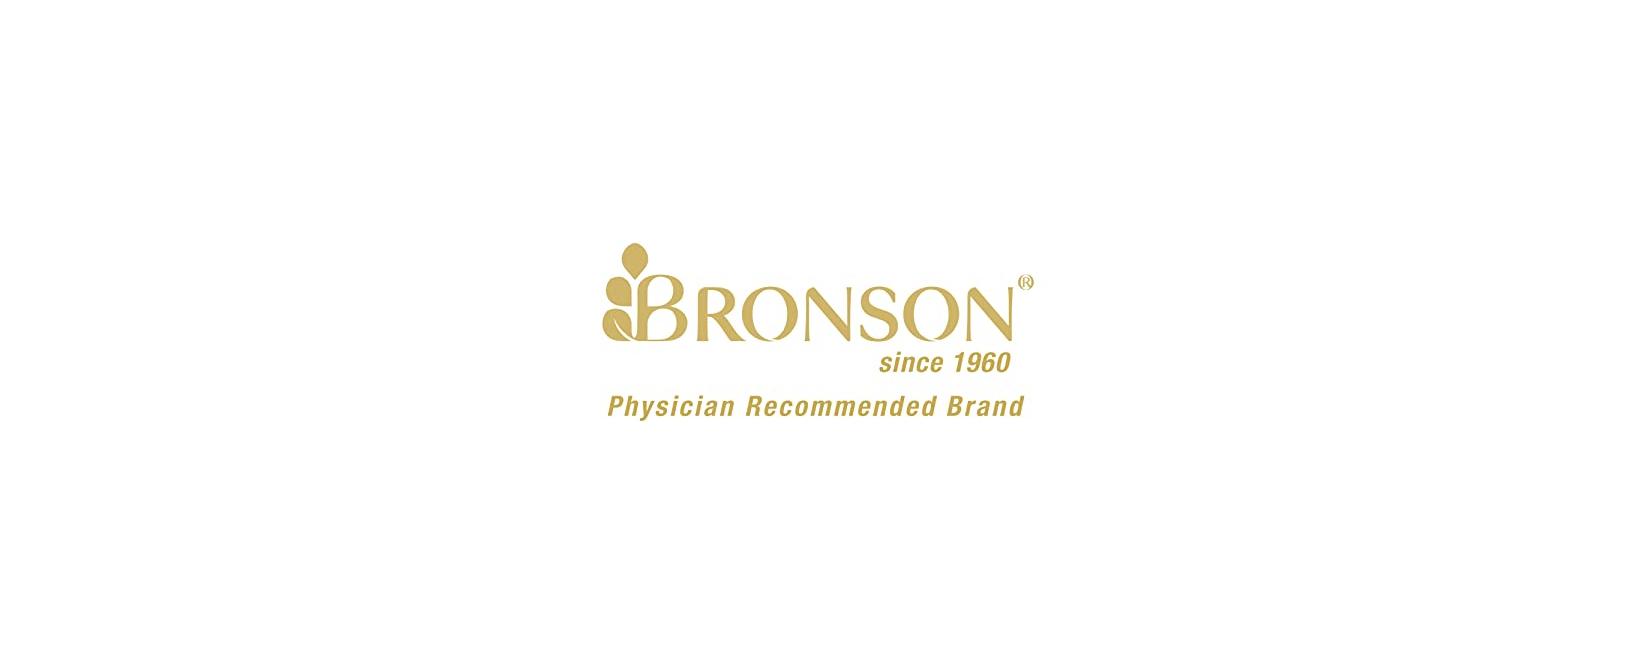 Bronson Vitamins Coupon Code 2021